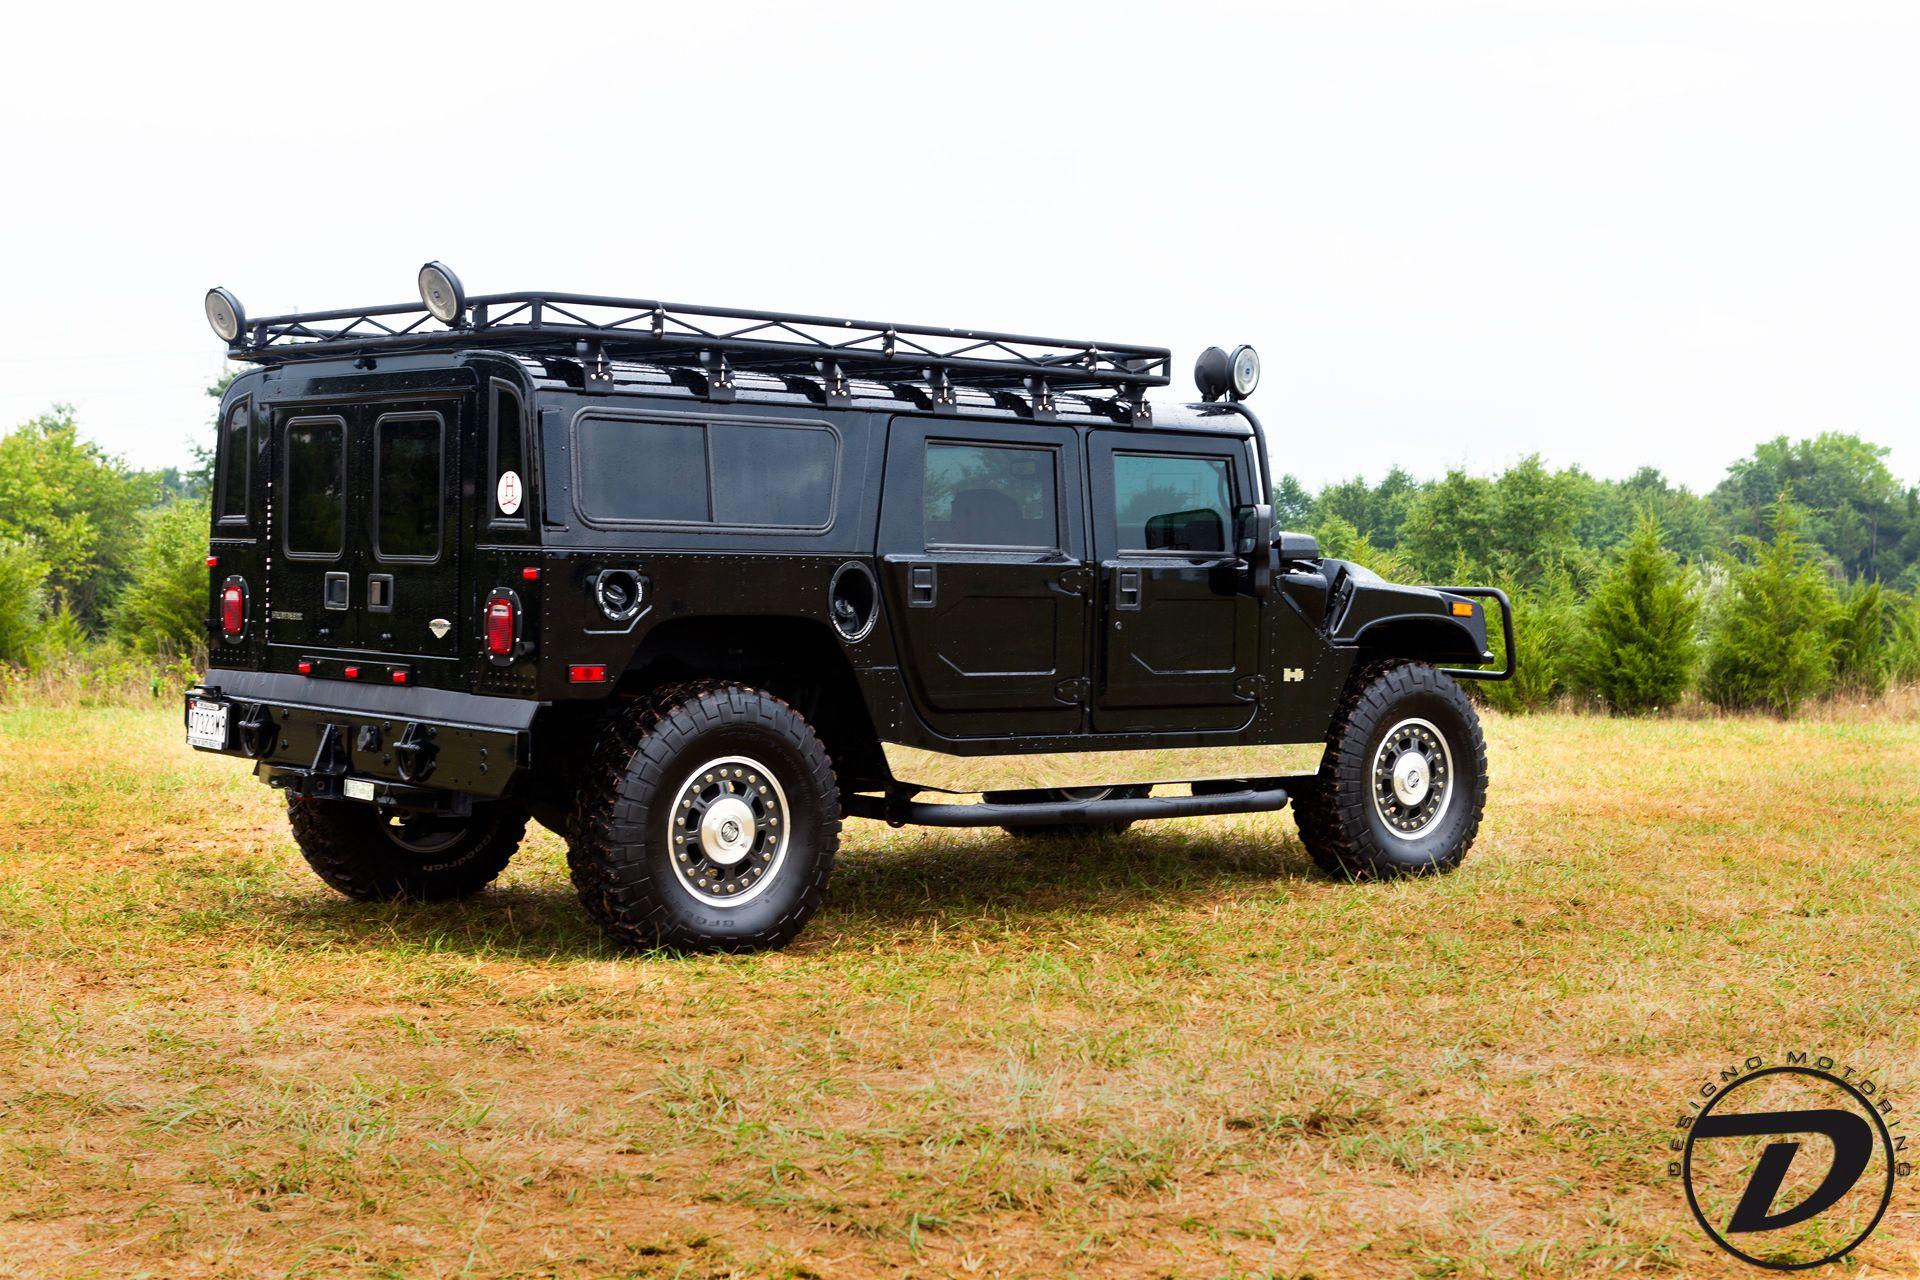 Hummer H1  Hummer H1 Alpha by Designo Motoring  Photographed by